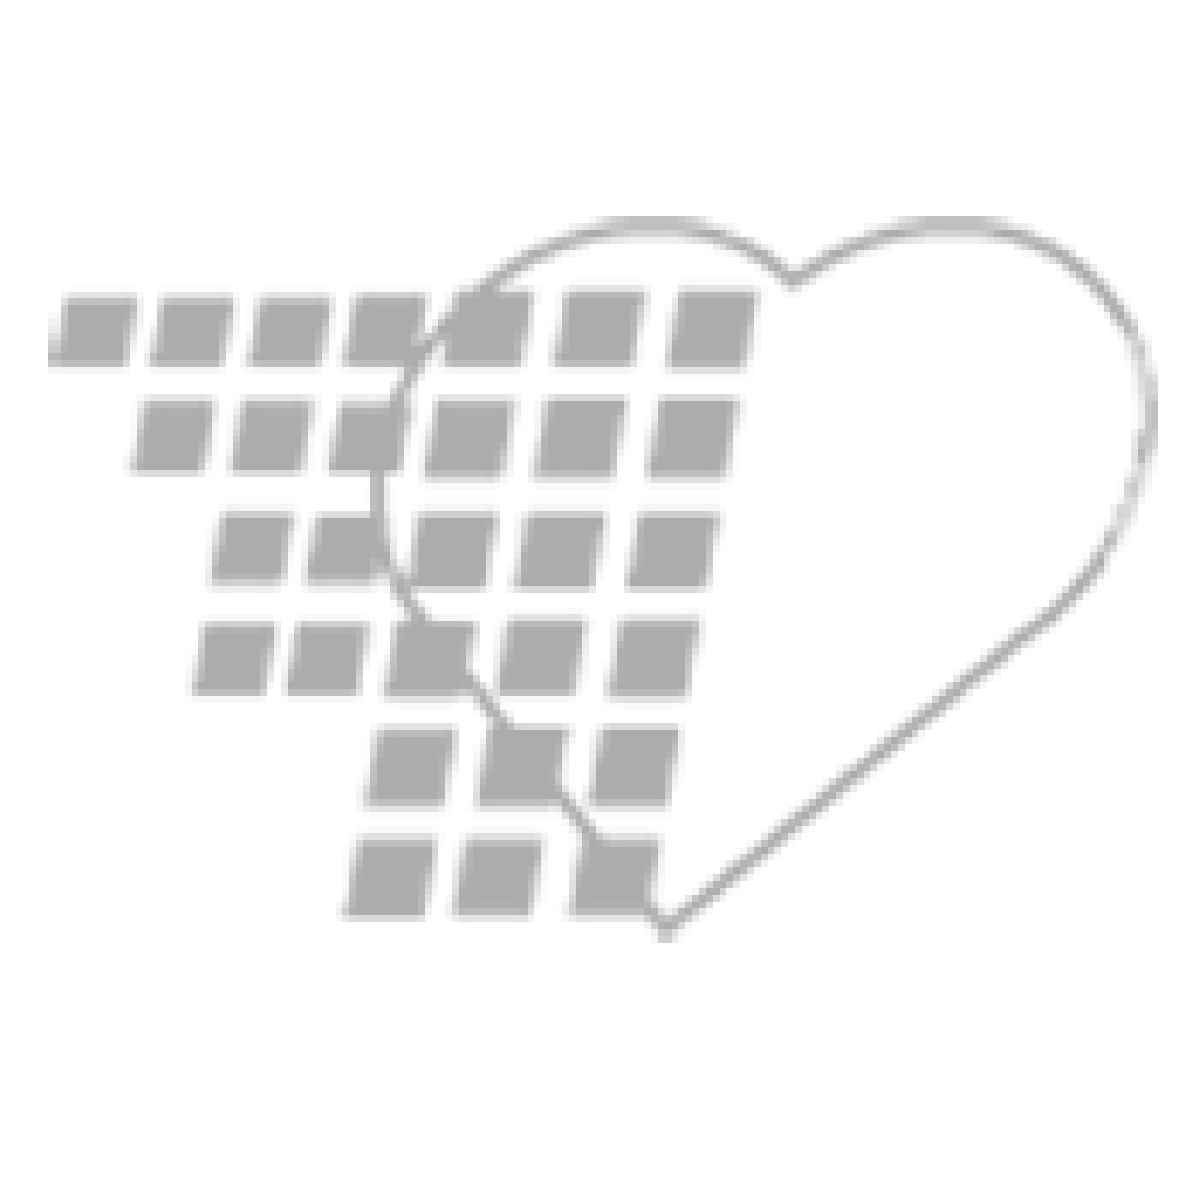 05-74-8111 Exam Cape T/P/T Universal - White